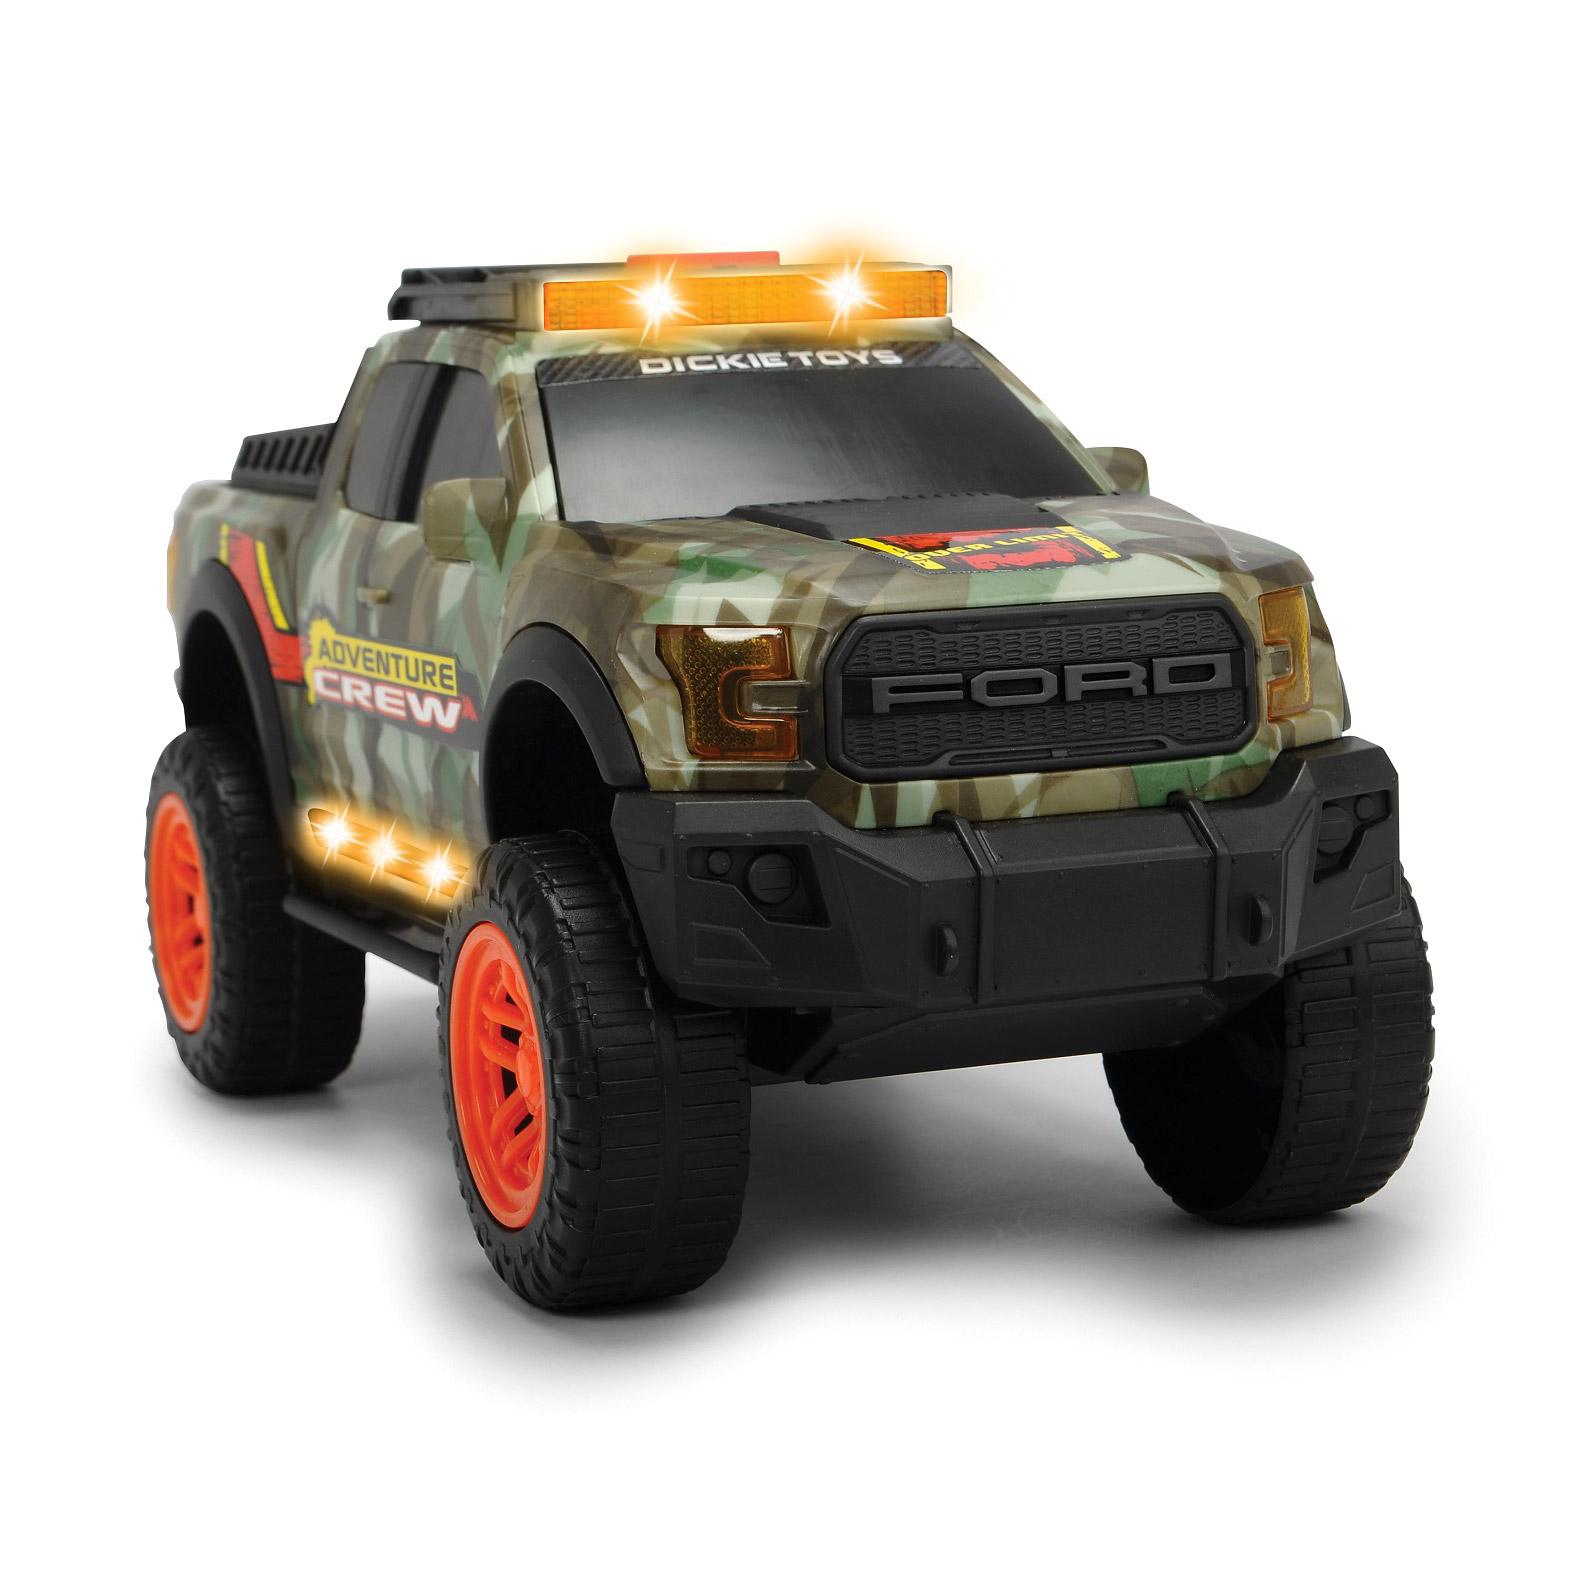 Машинка Dickie Toys Adventure Ford F150 Raptor 33 см